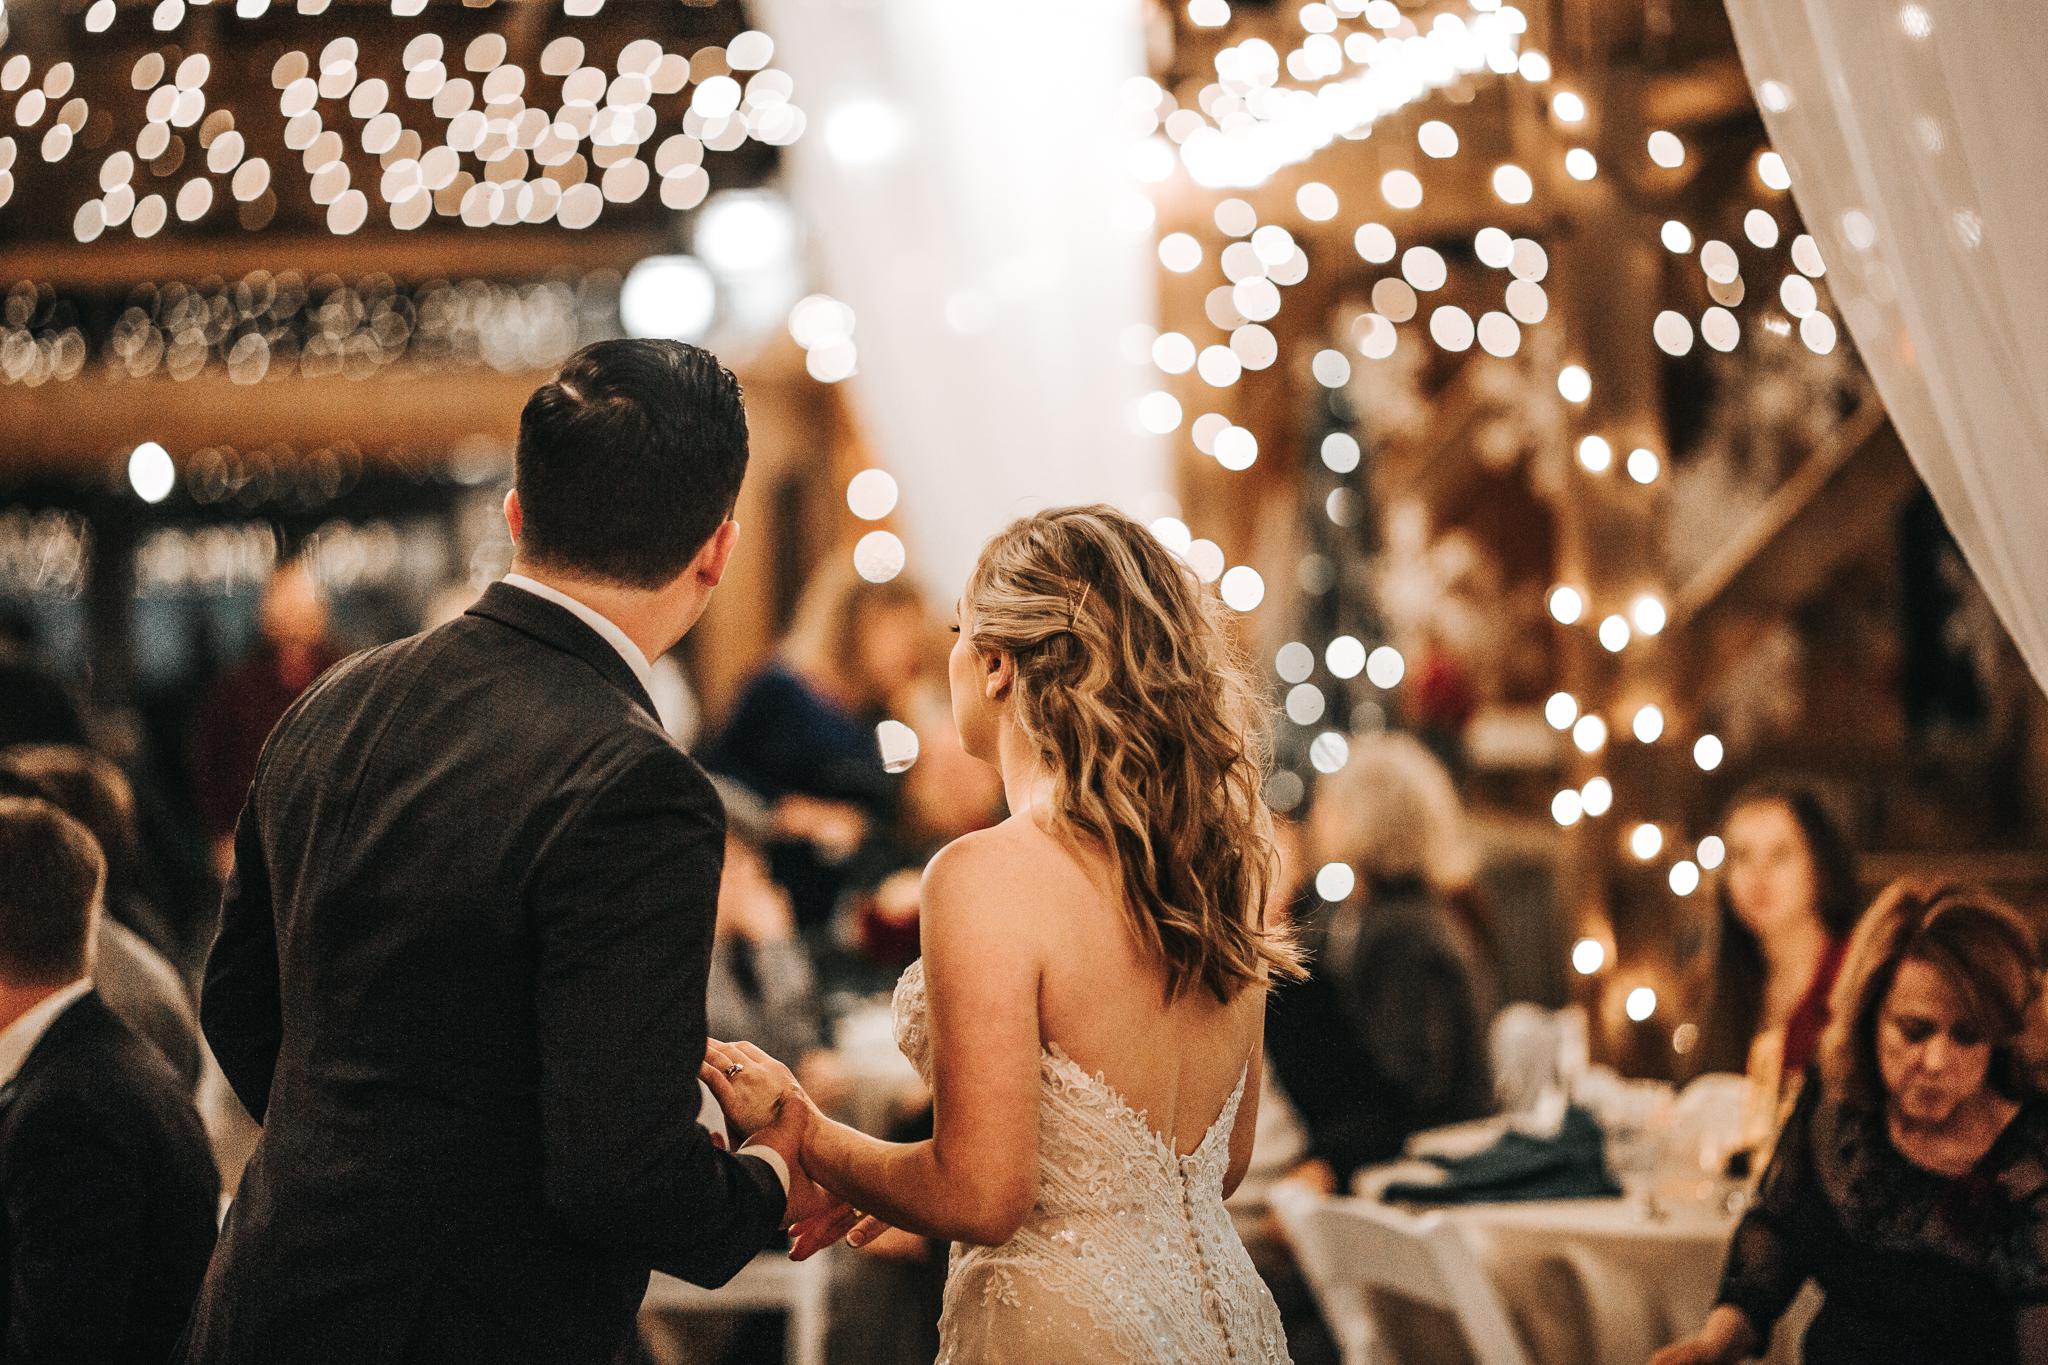 0151 Ariana Jordan Photo - Cameron & Lauren's Wedding at Talon Winery  4557.jpg